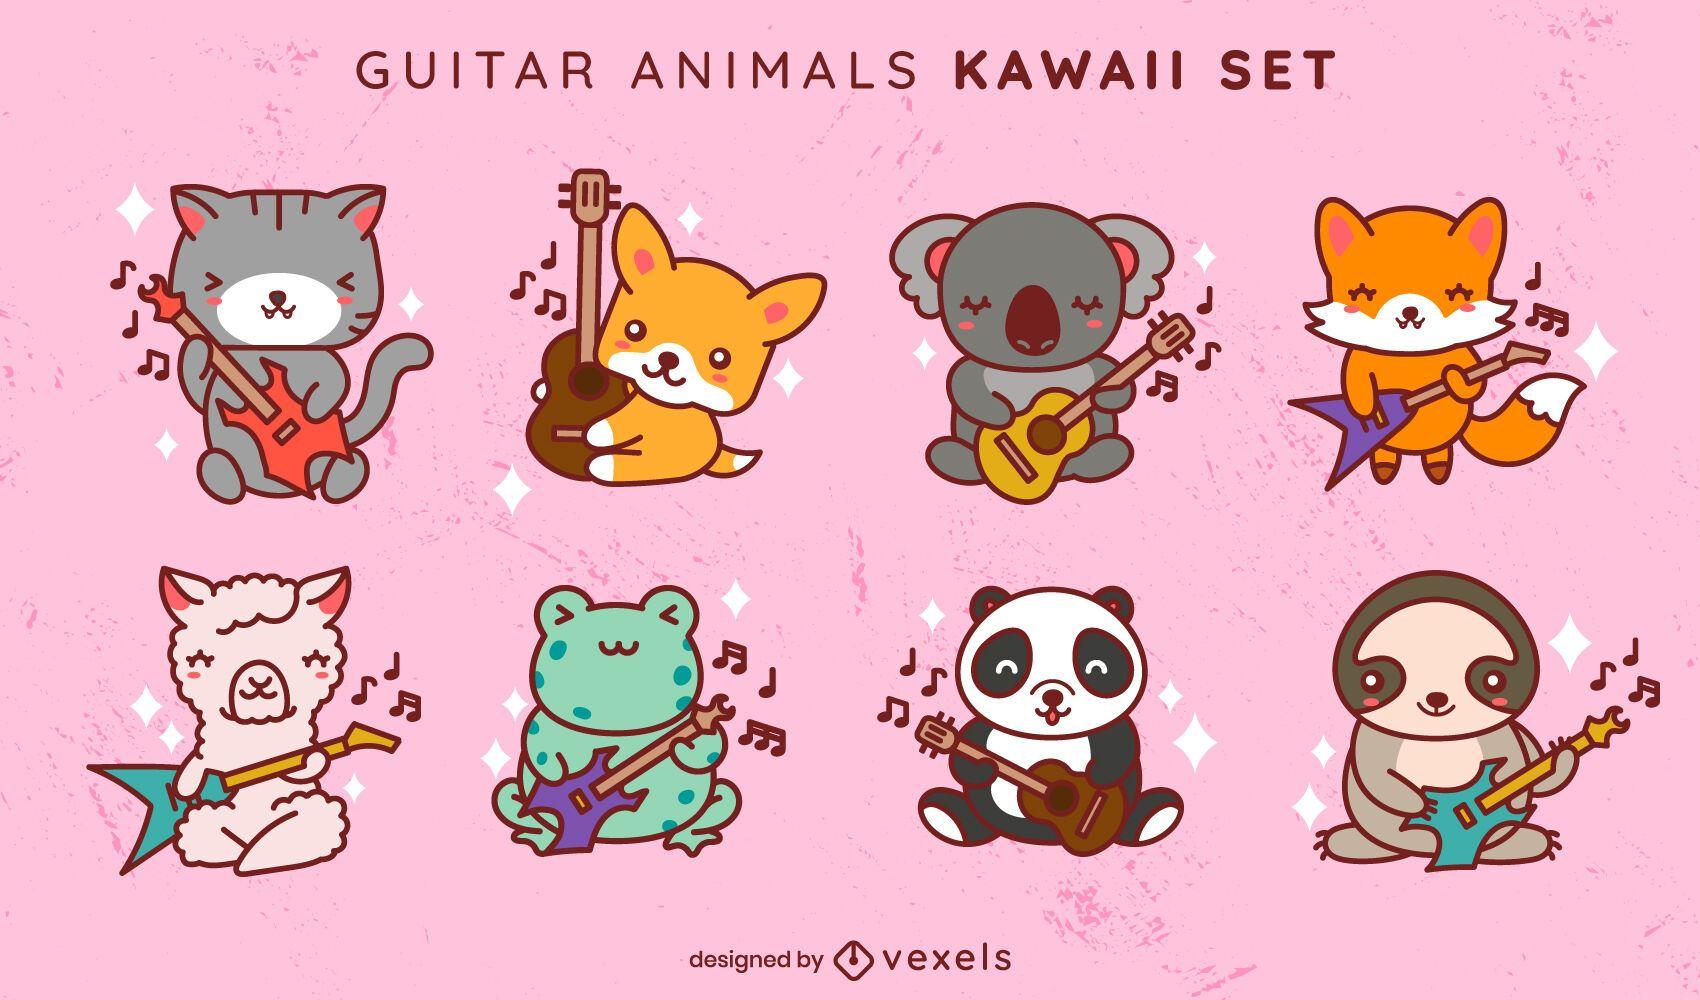 Set de animales de guitarra kawaii